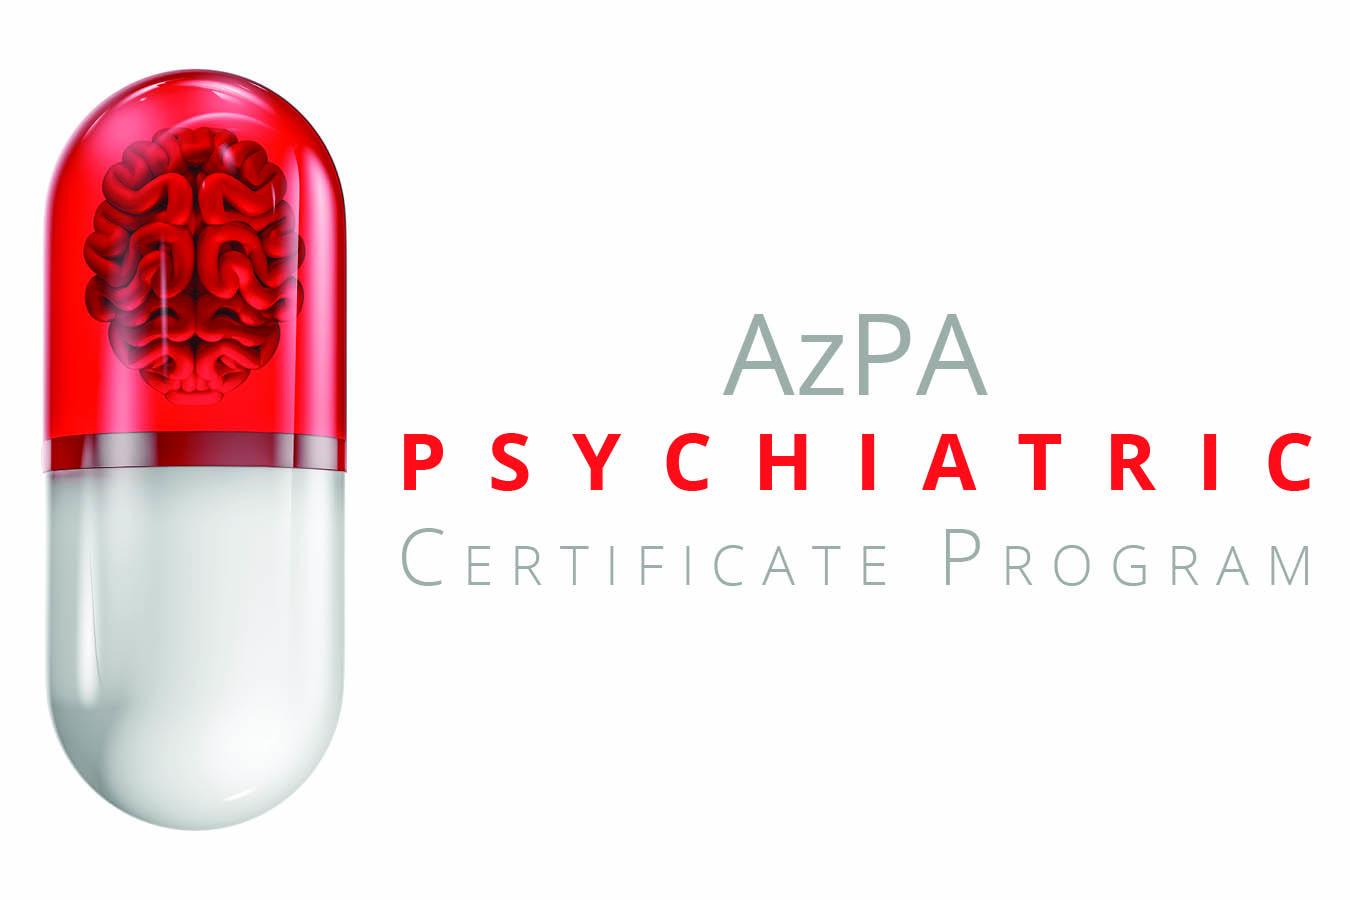 Azpa Psychiatric Certificate Training Program Arizona Pharmacy